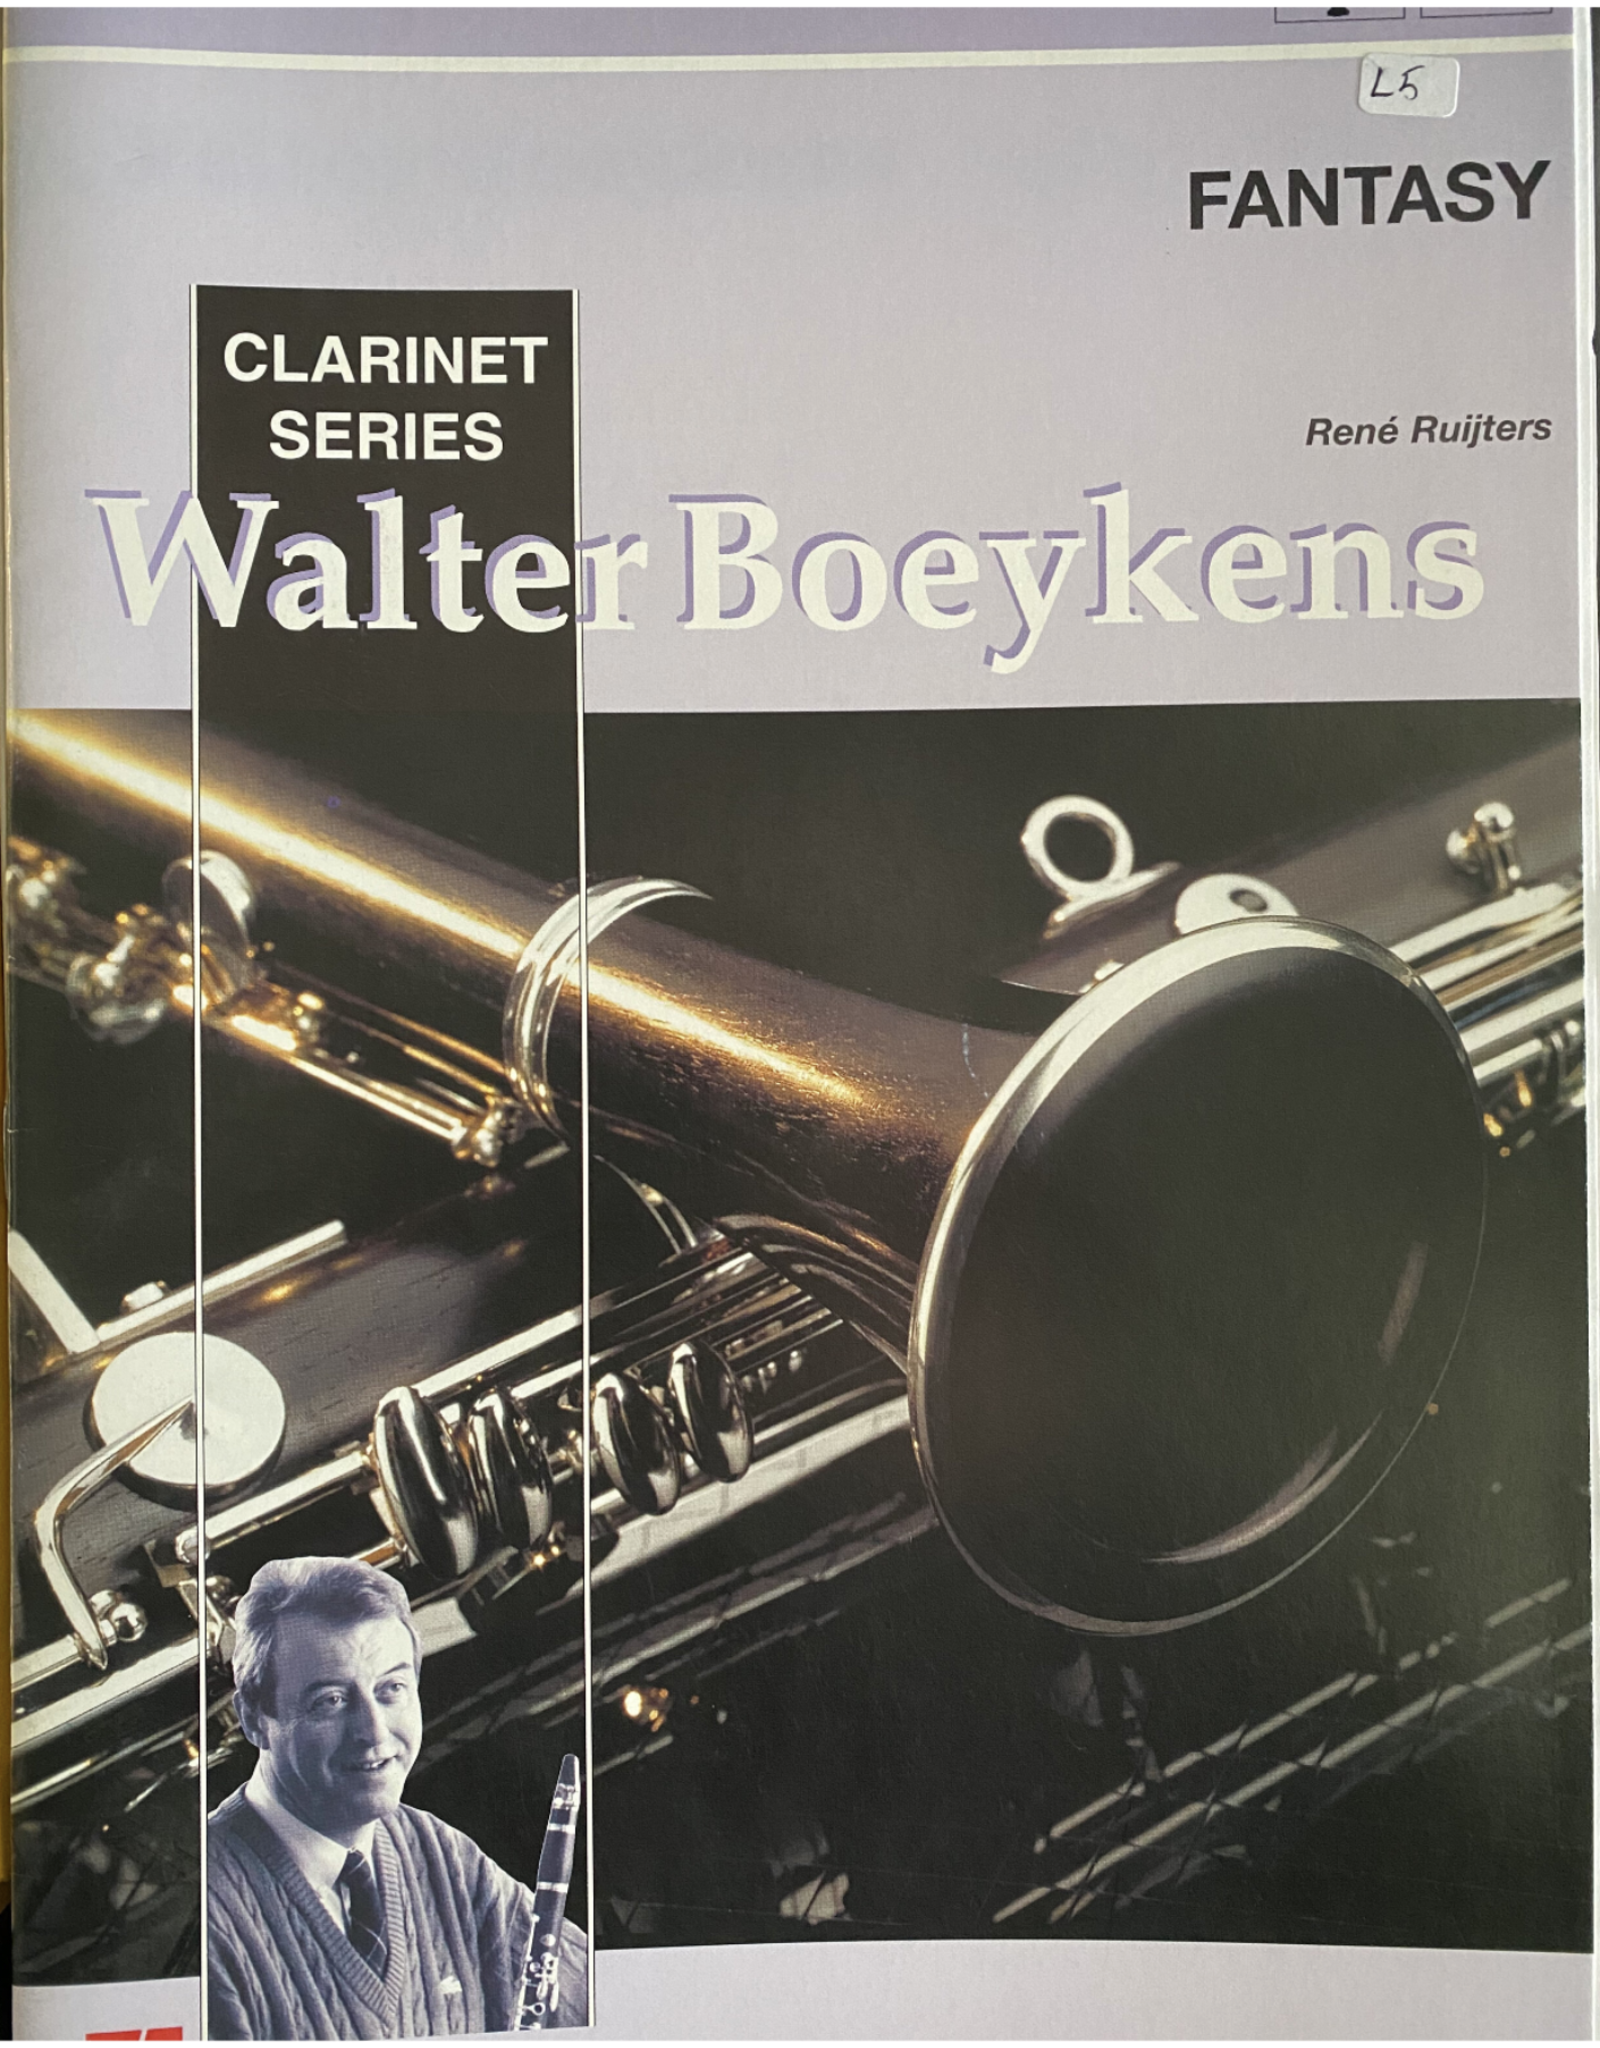 Hal Leonard Fantasy Walter Boeykens Clarinet Series by Rene Ruijters De Haske Play-Along Book